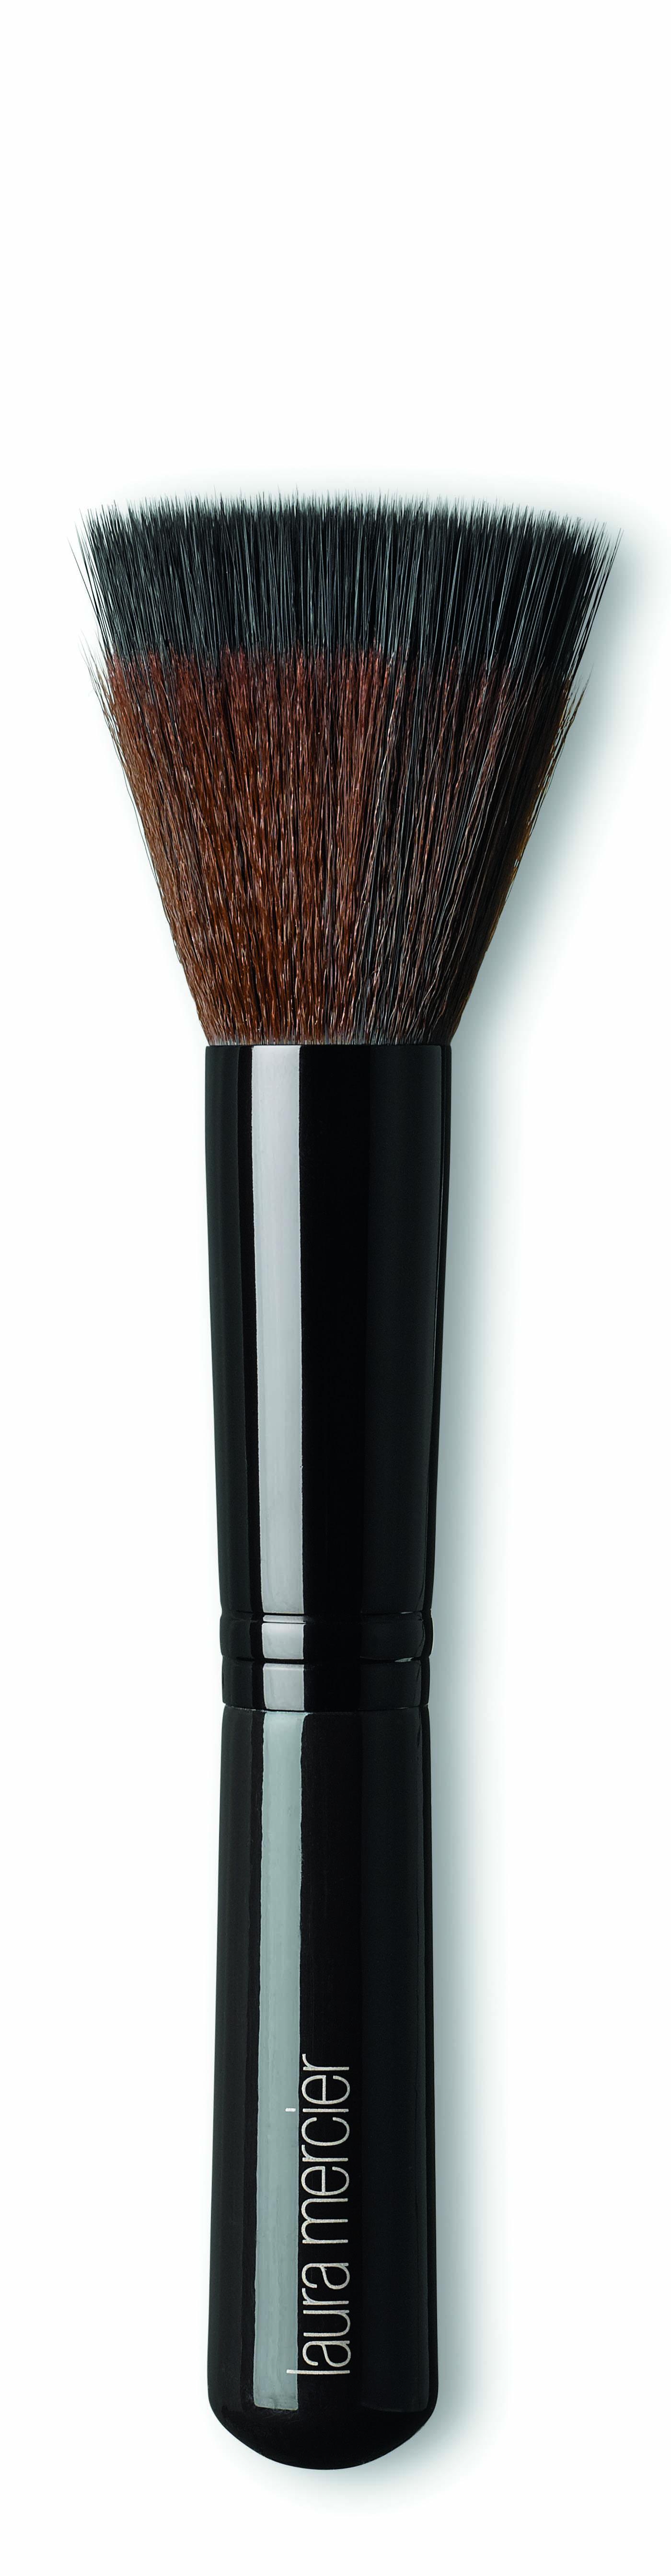 Finishing Face Brush